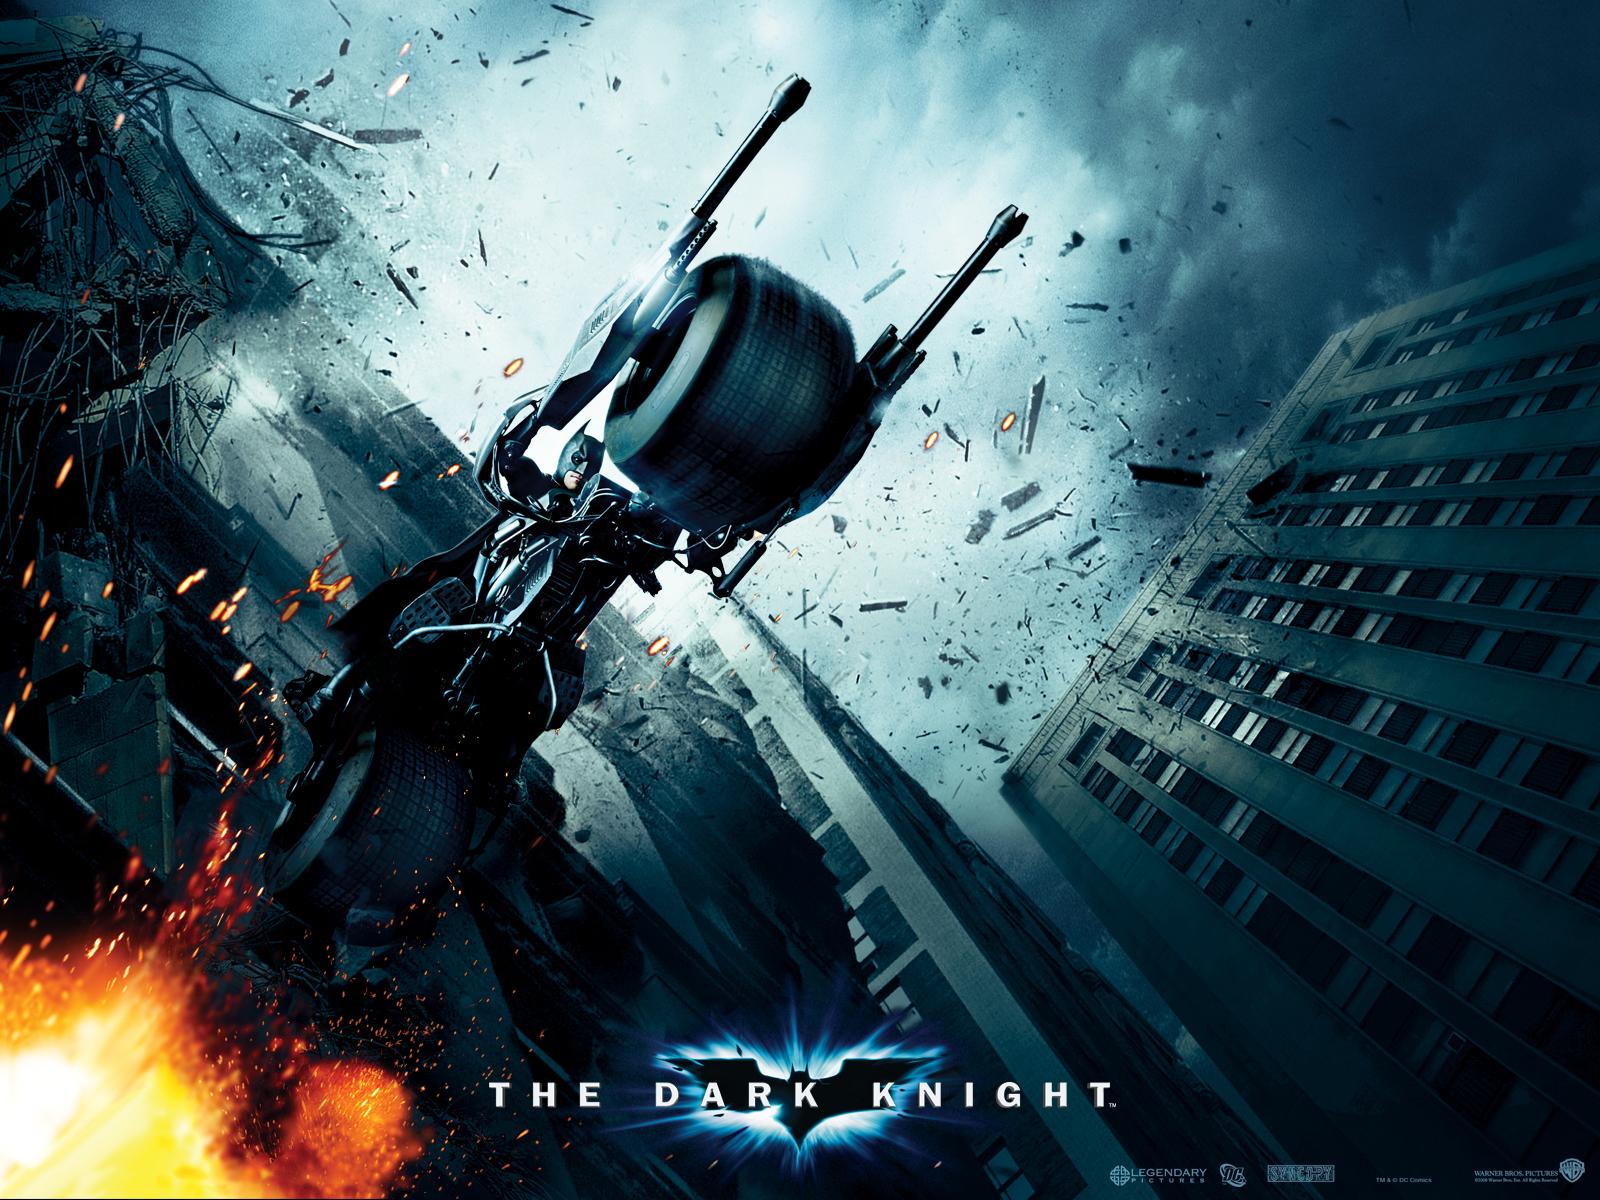 The Dark Knight Movie Wallpaper